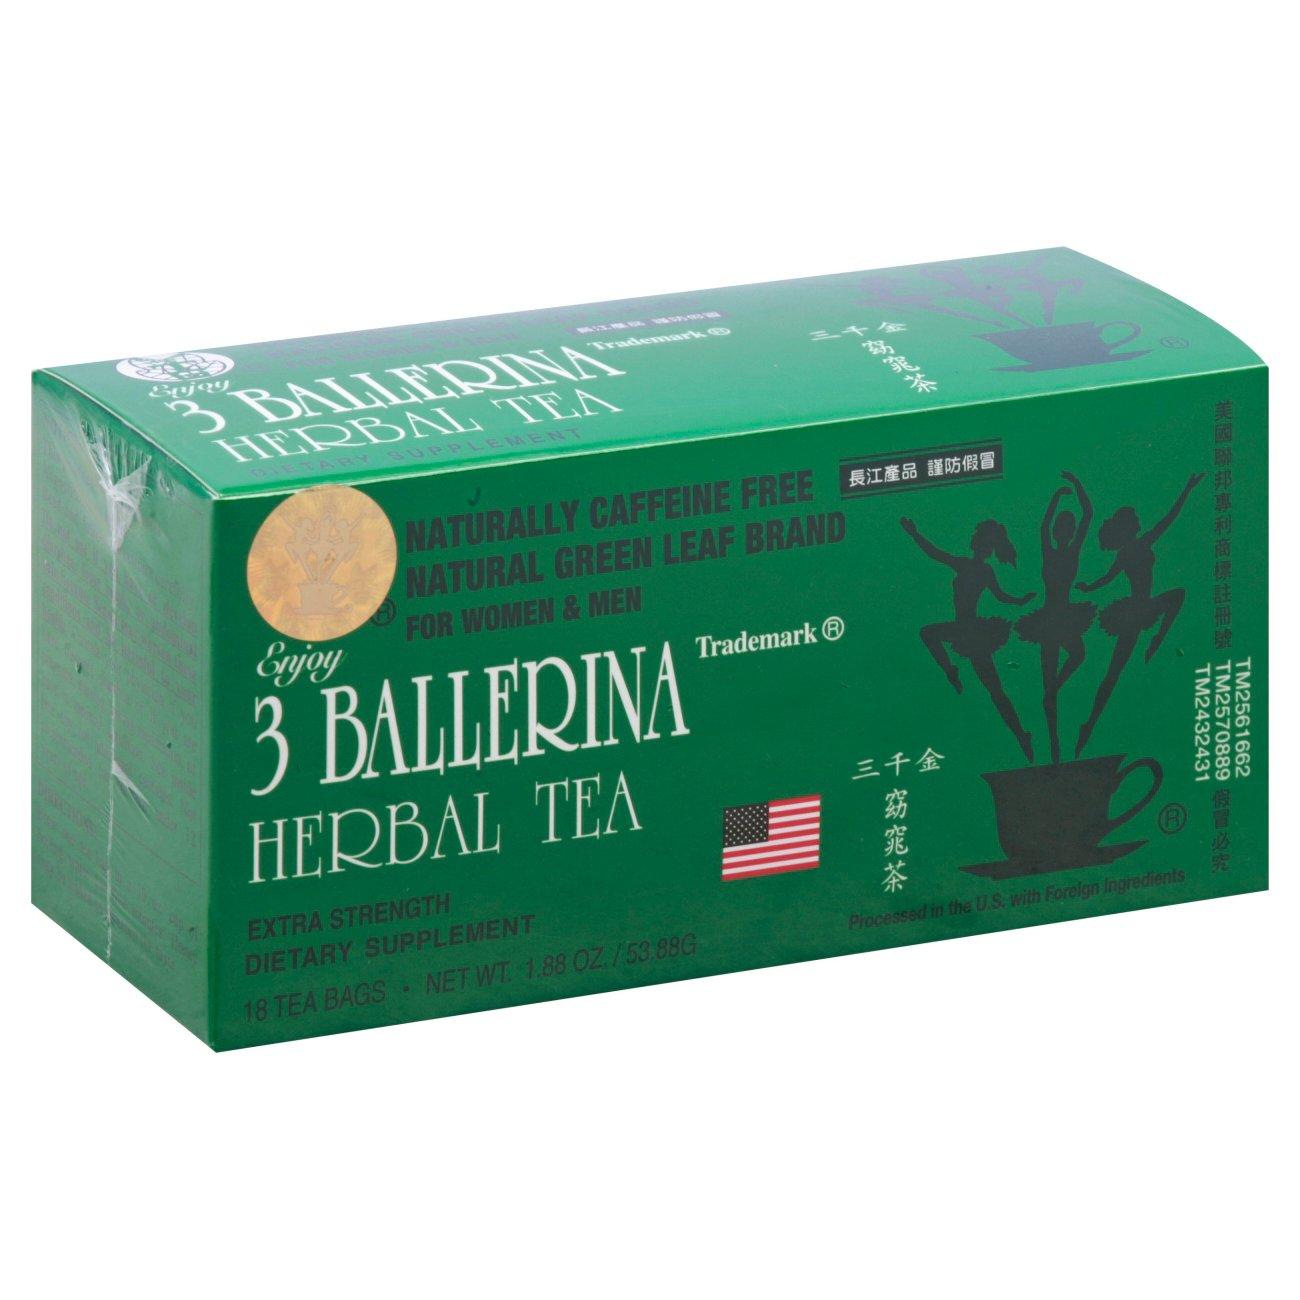 nem éget-e zsírt a balerina tea